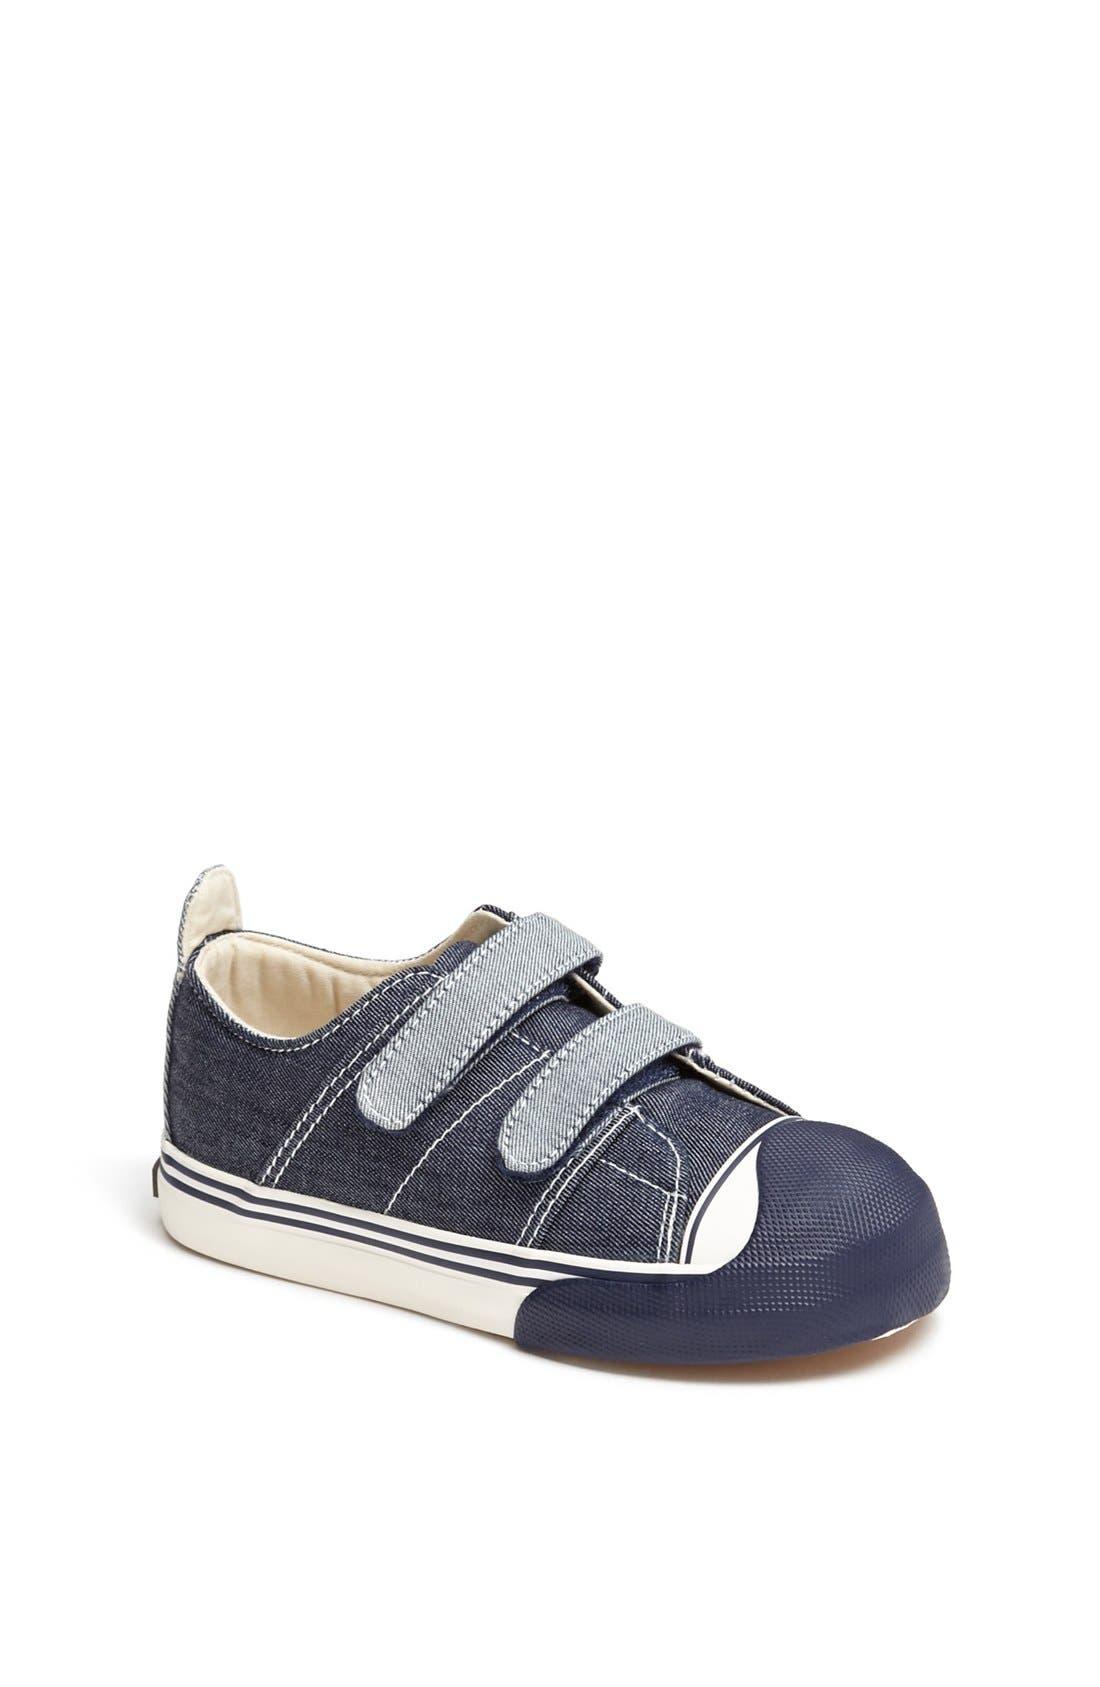 Main Image - Morgan & Milo 'Charlie' Sneaker (Walker & Toddler)